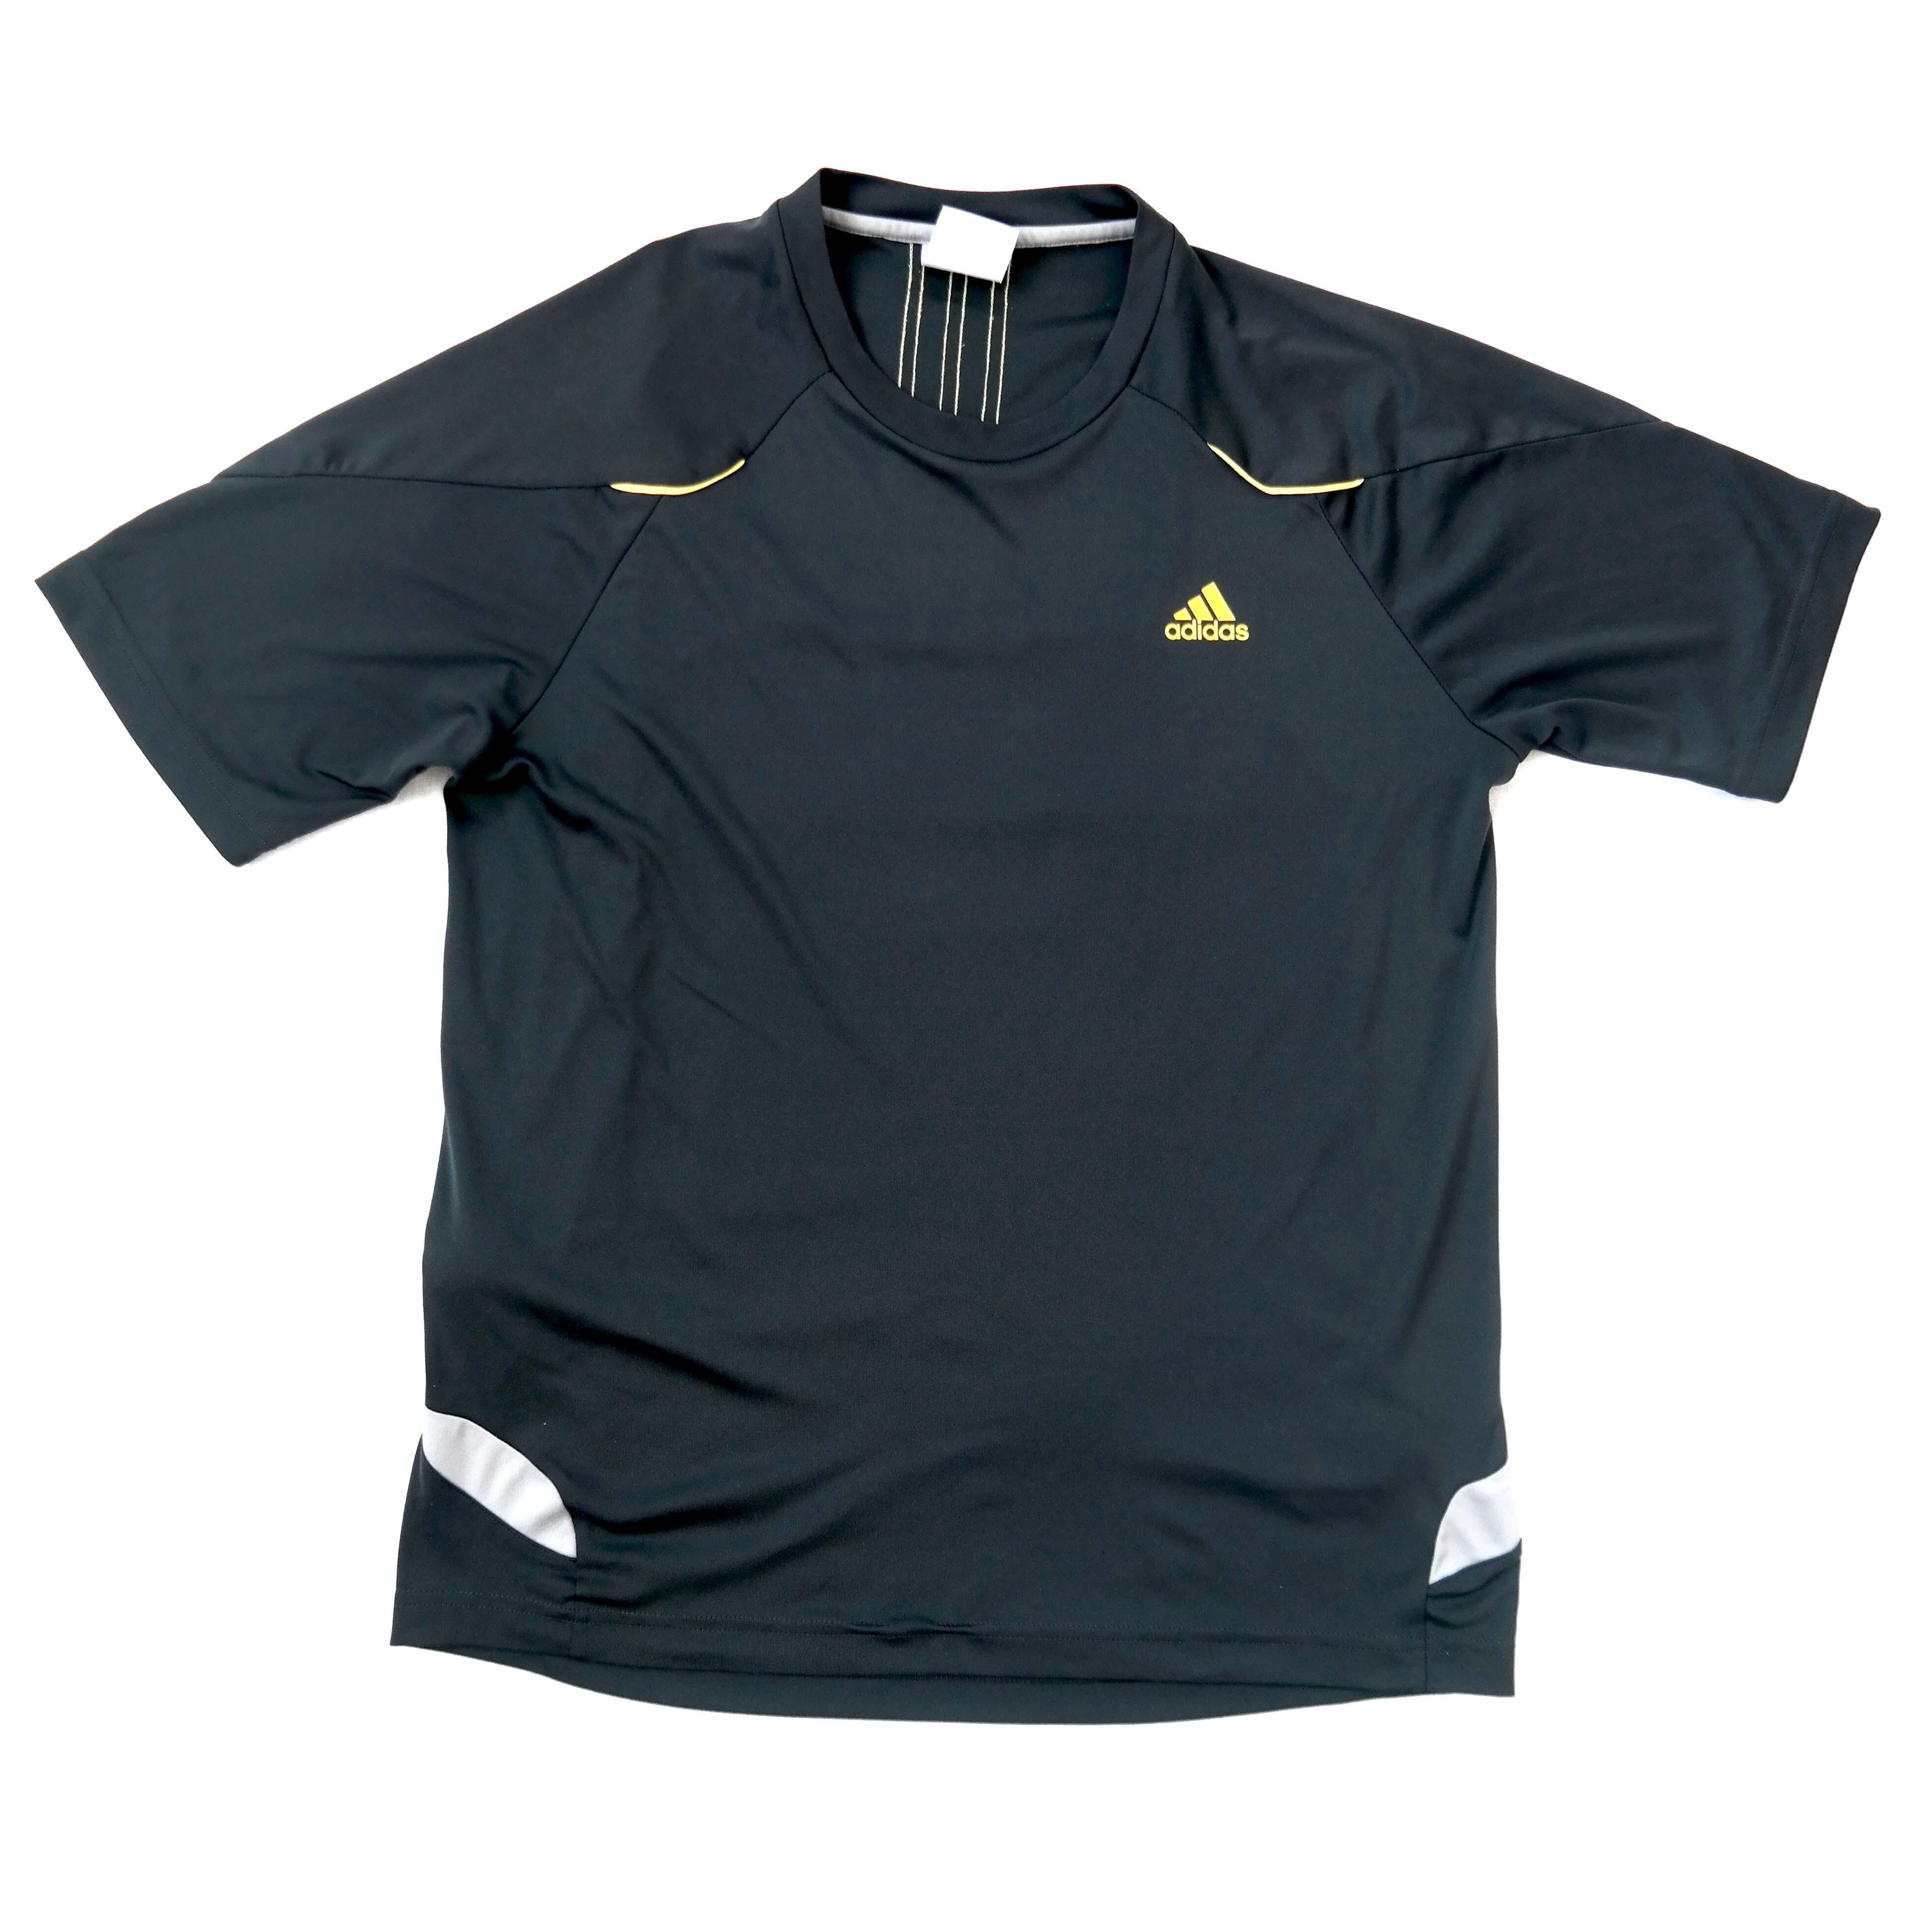 7b41eae7a66 Мужская спортивная футболка Adidas - секонд хенд «ЗигЗаг Удачи» в ...